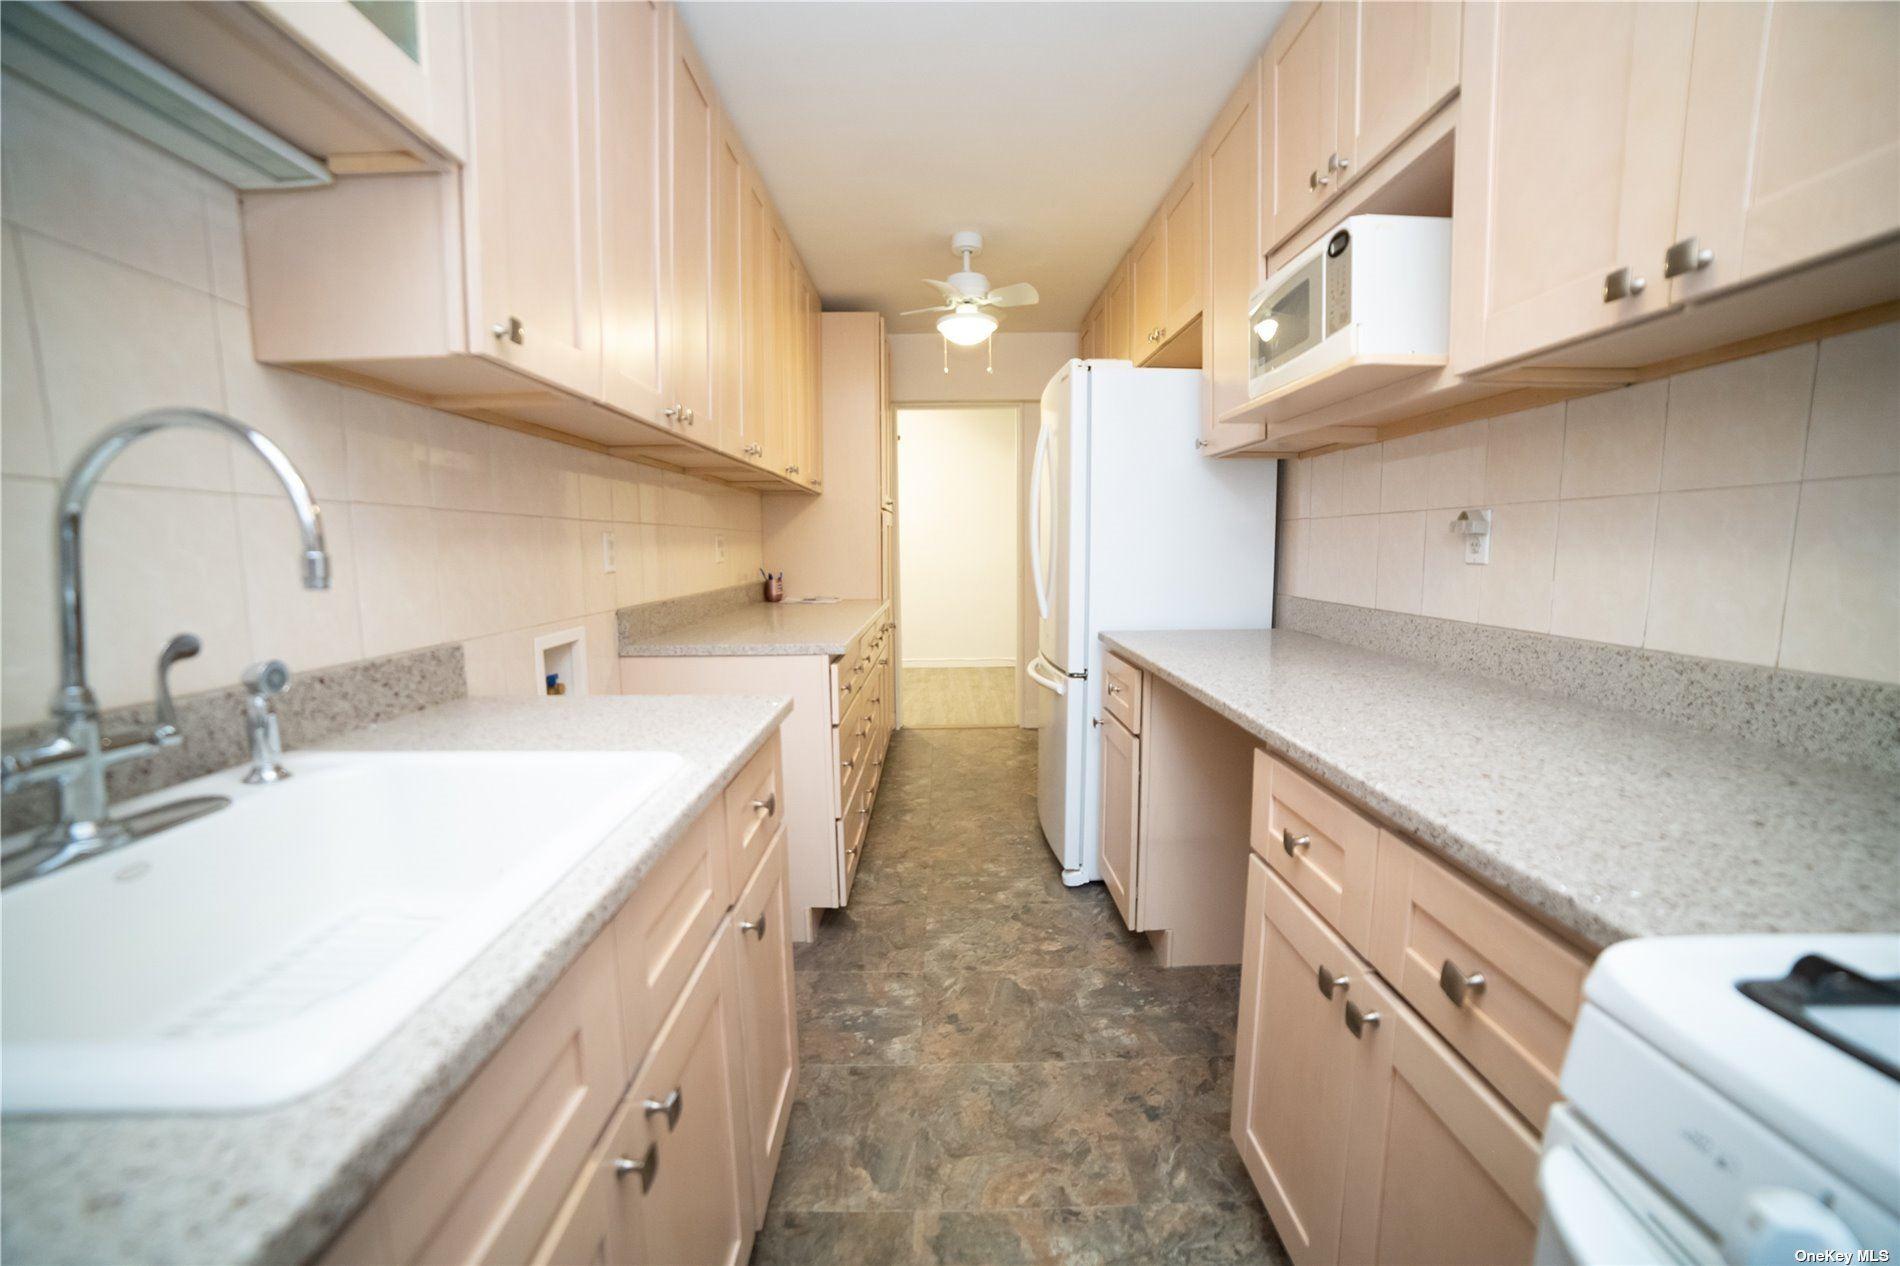 83-30 98 Street #1J, Woodhaven, NY 11421 - MLS#: 3280496